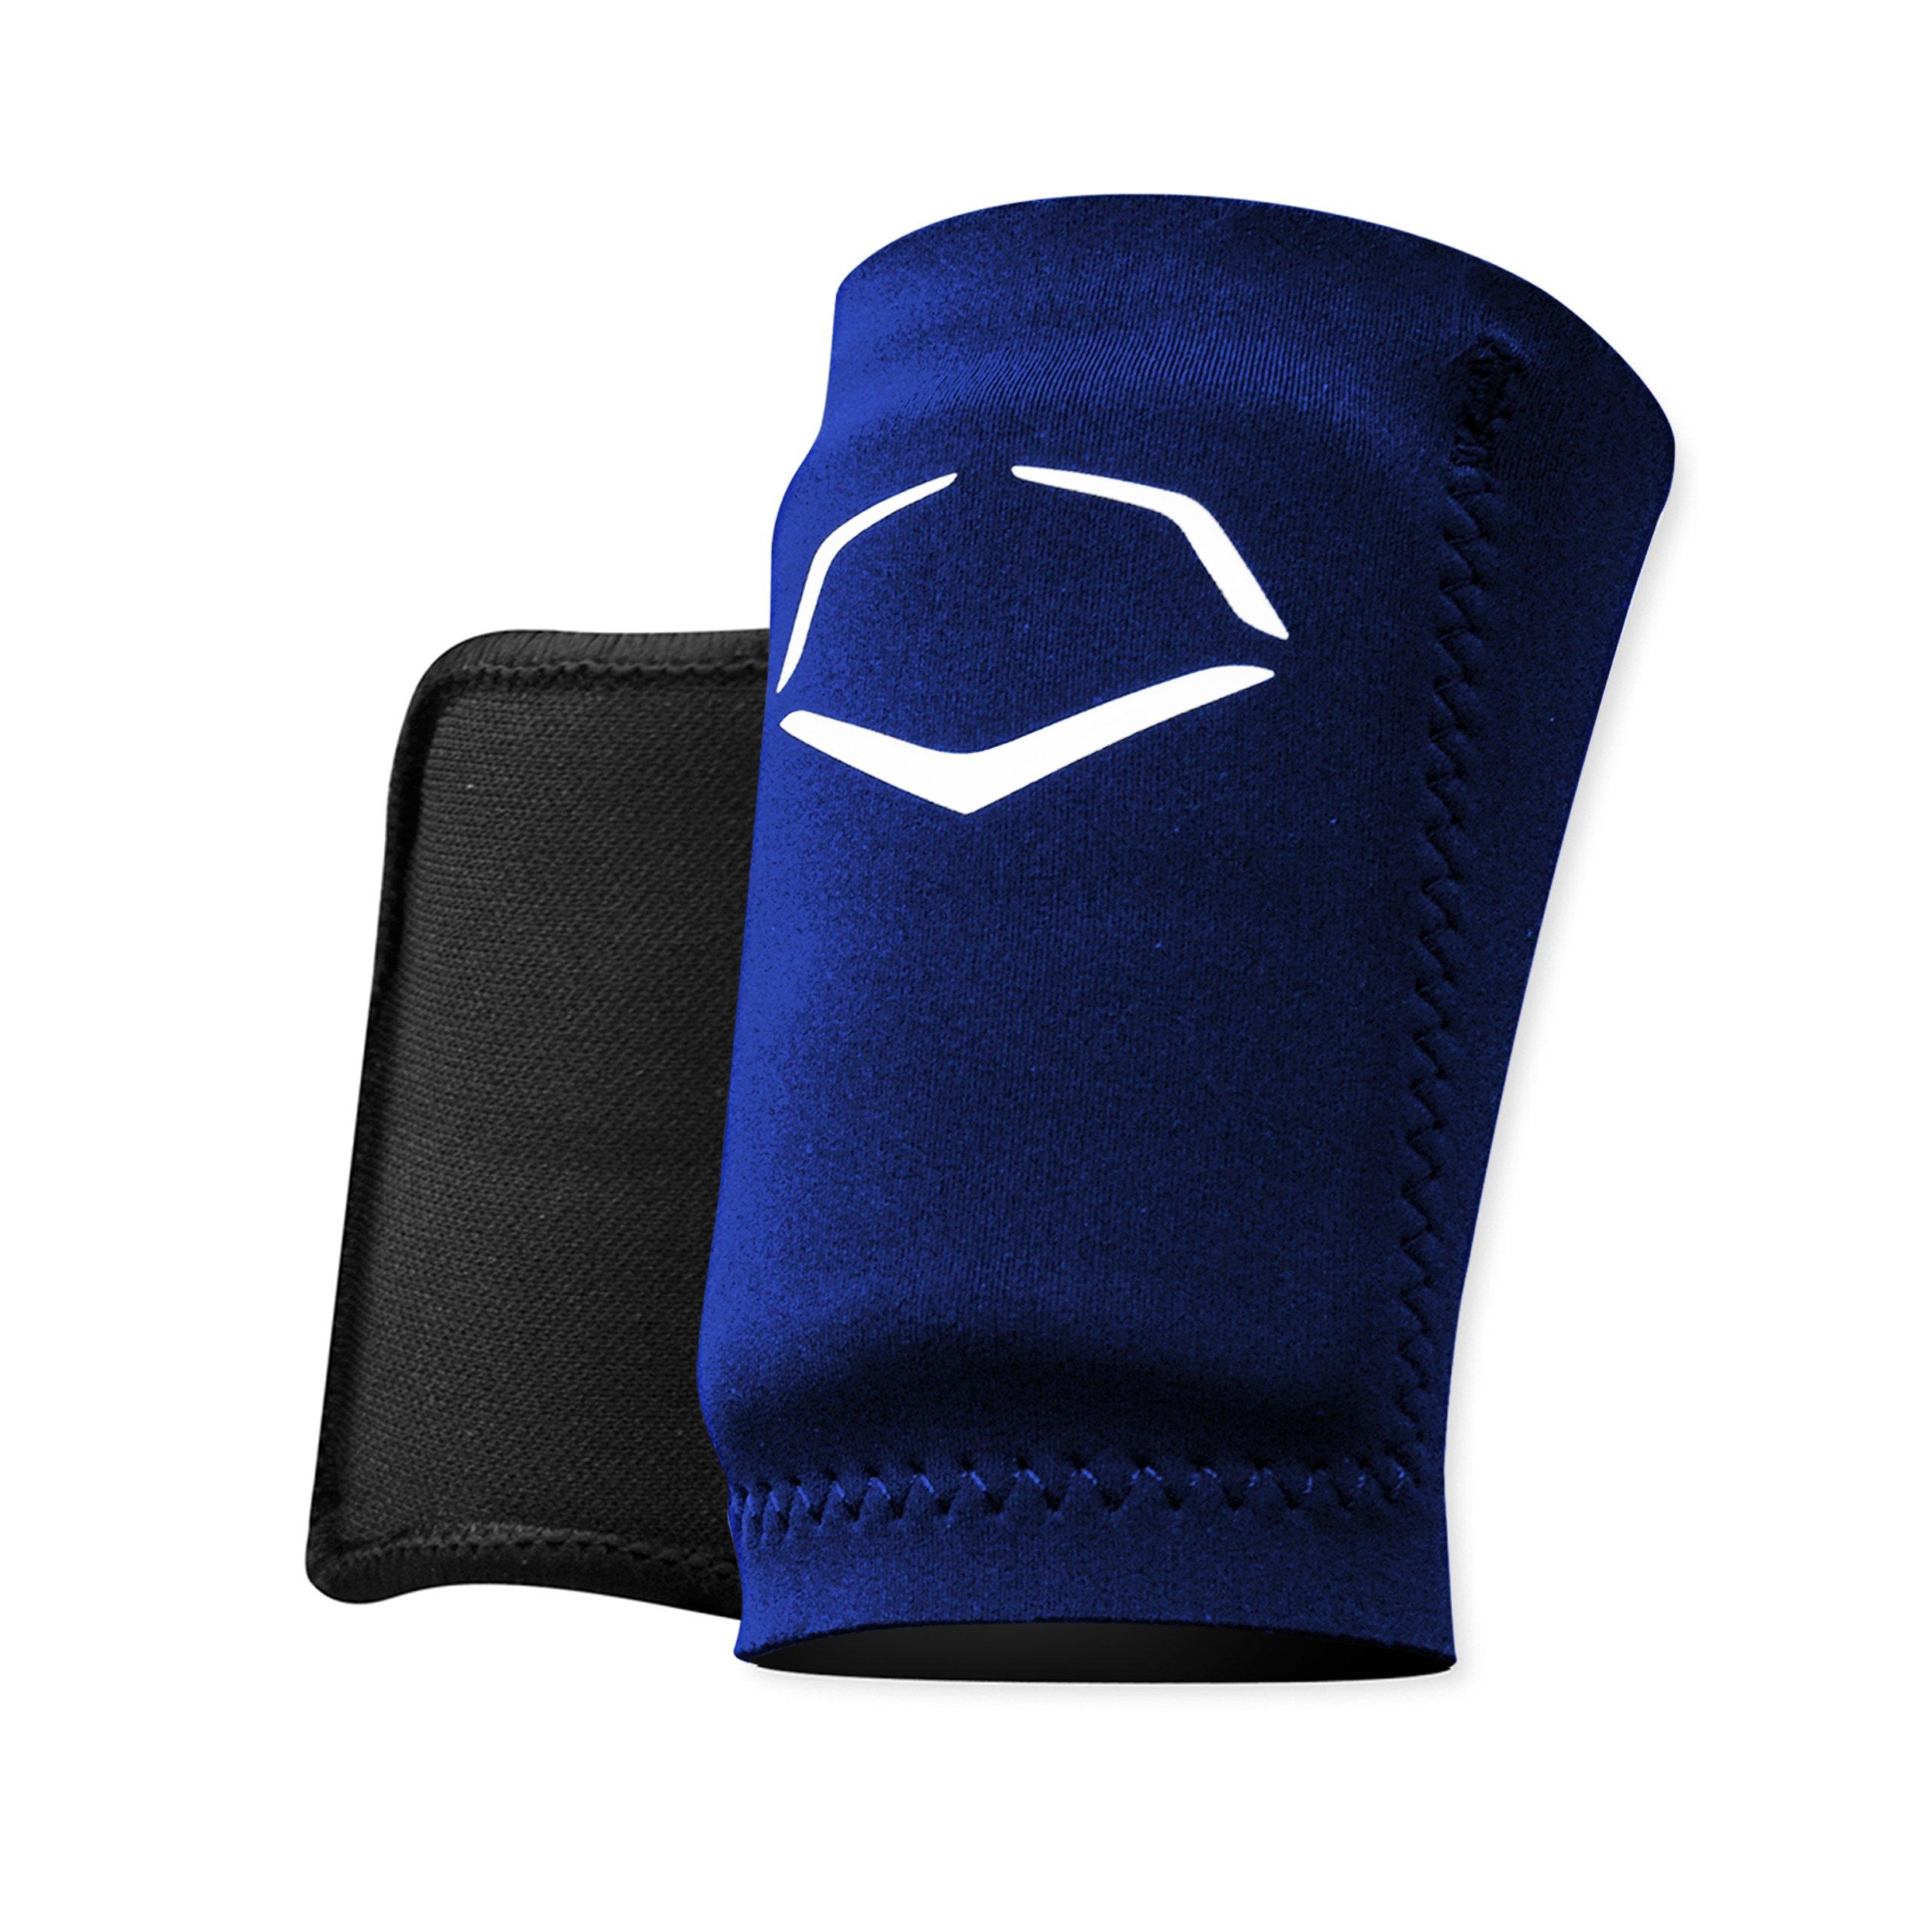 EvoShield Protective Baseball Wrist Guard,Navy,Medium by EvoShield